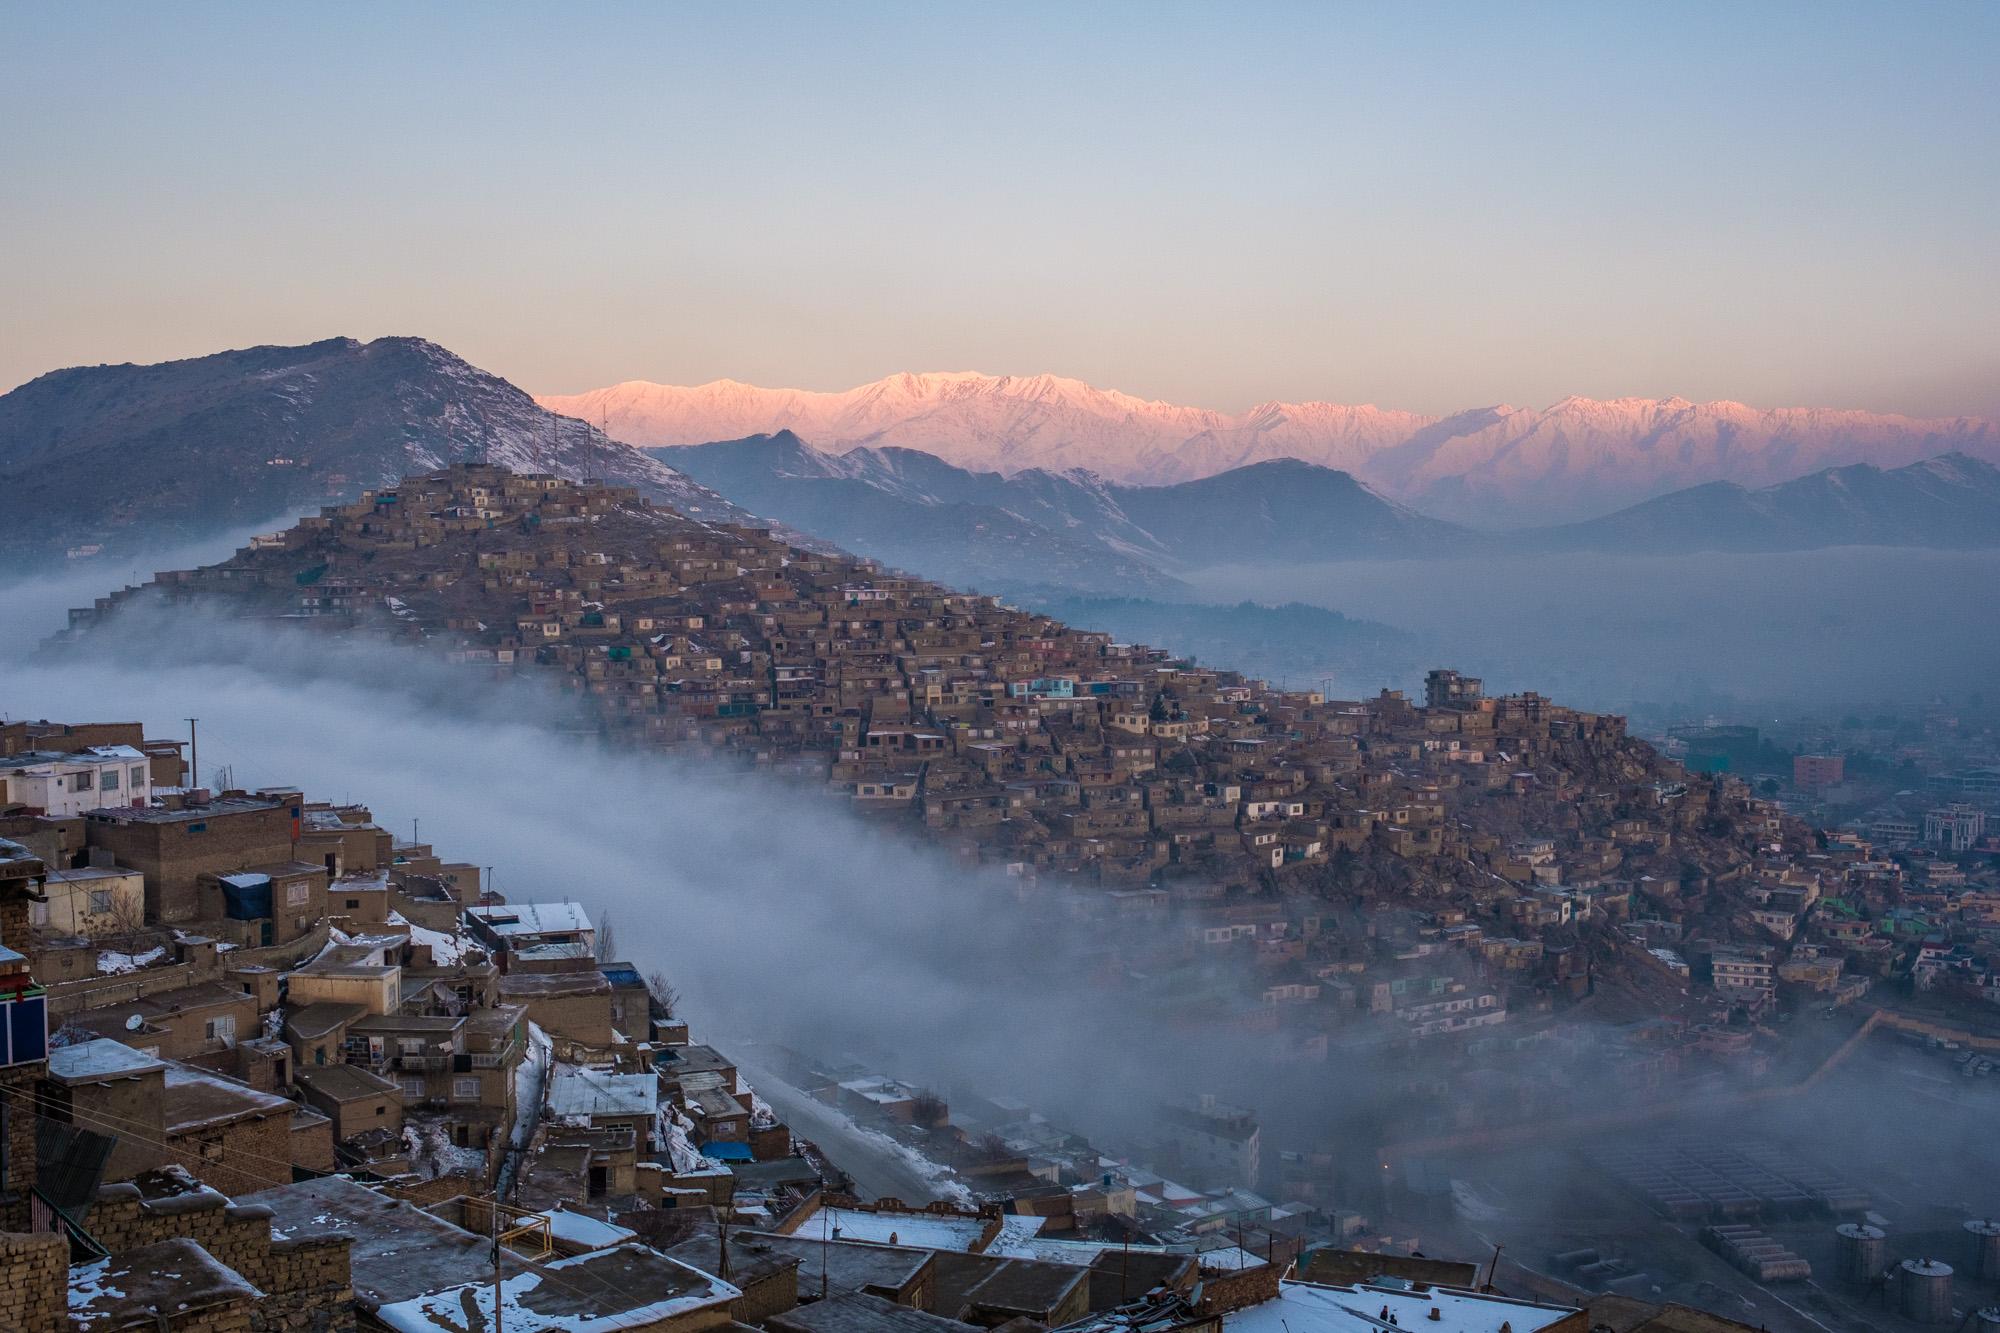 Morning fog rolls over the shoulder of TV hill, in central Kabul. 2018.